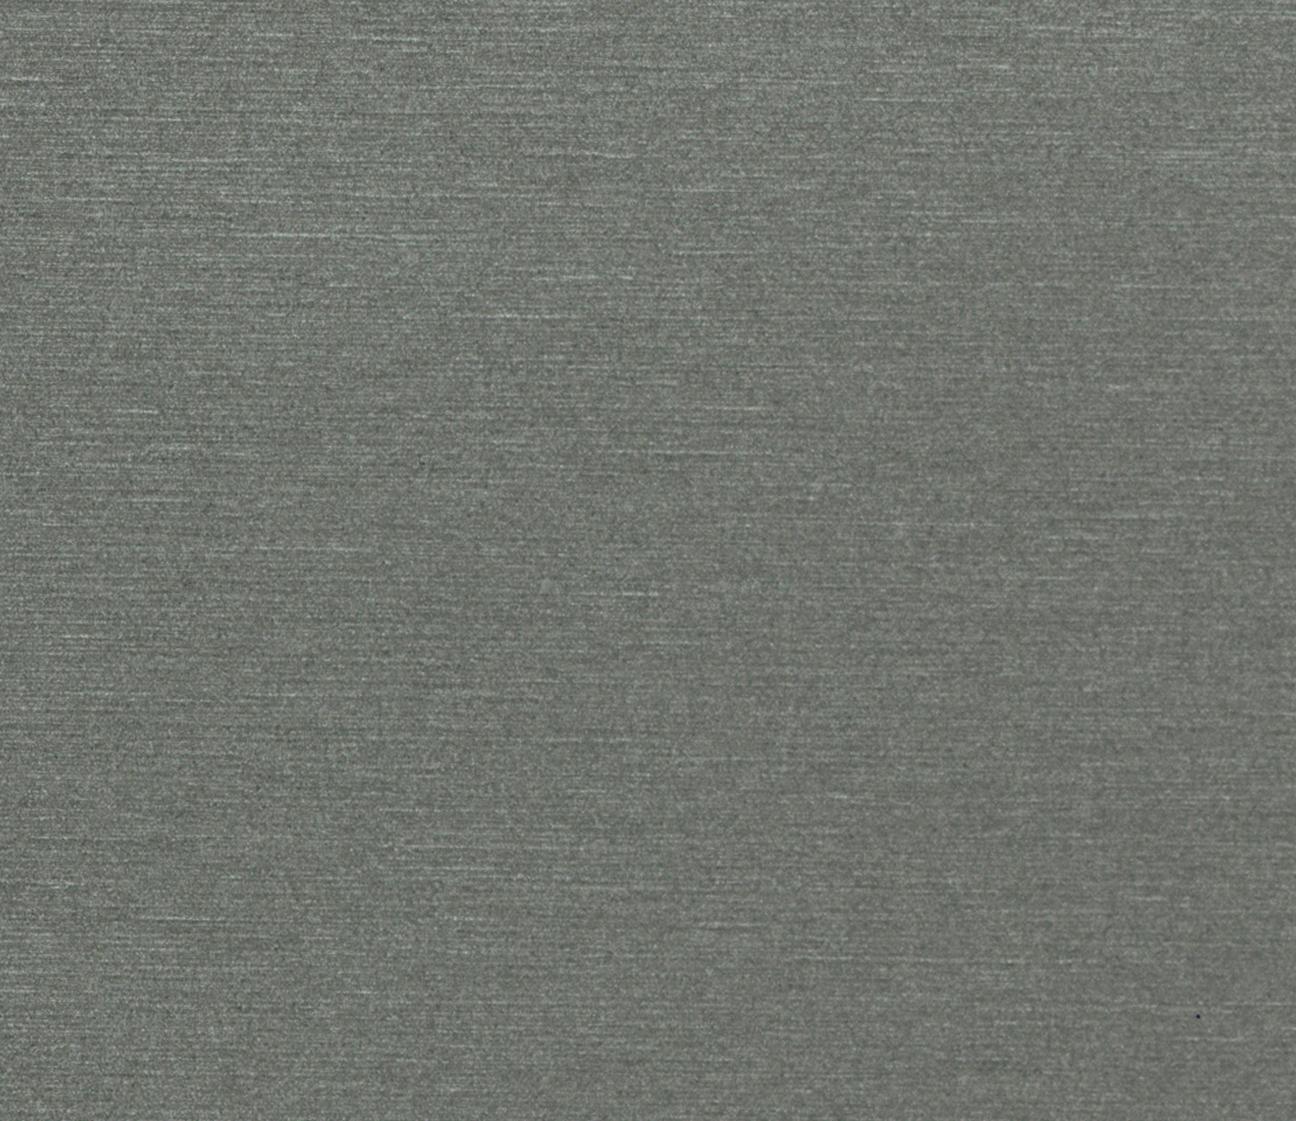 Brushed gebuerstet strukturen graphit metallic autofolien for Klebefolie billig